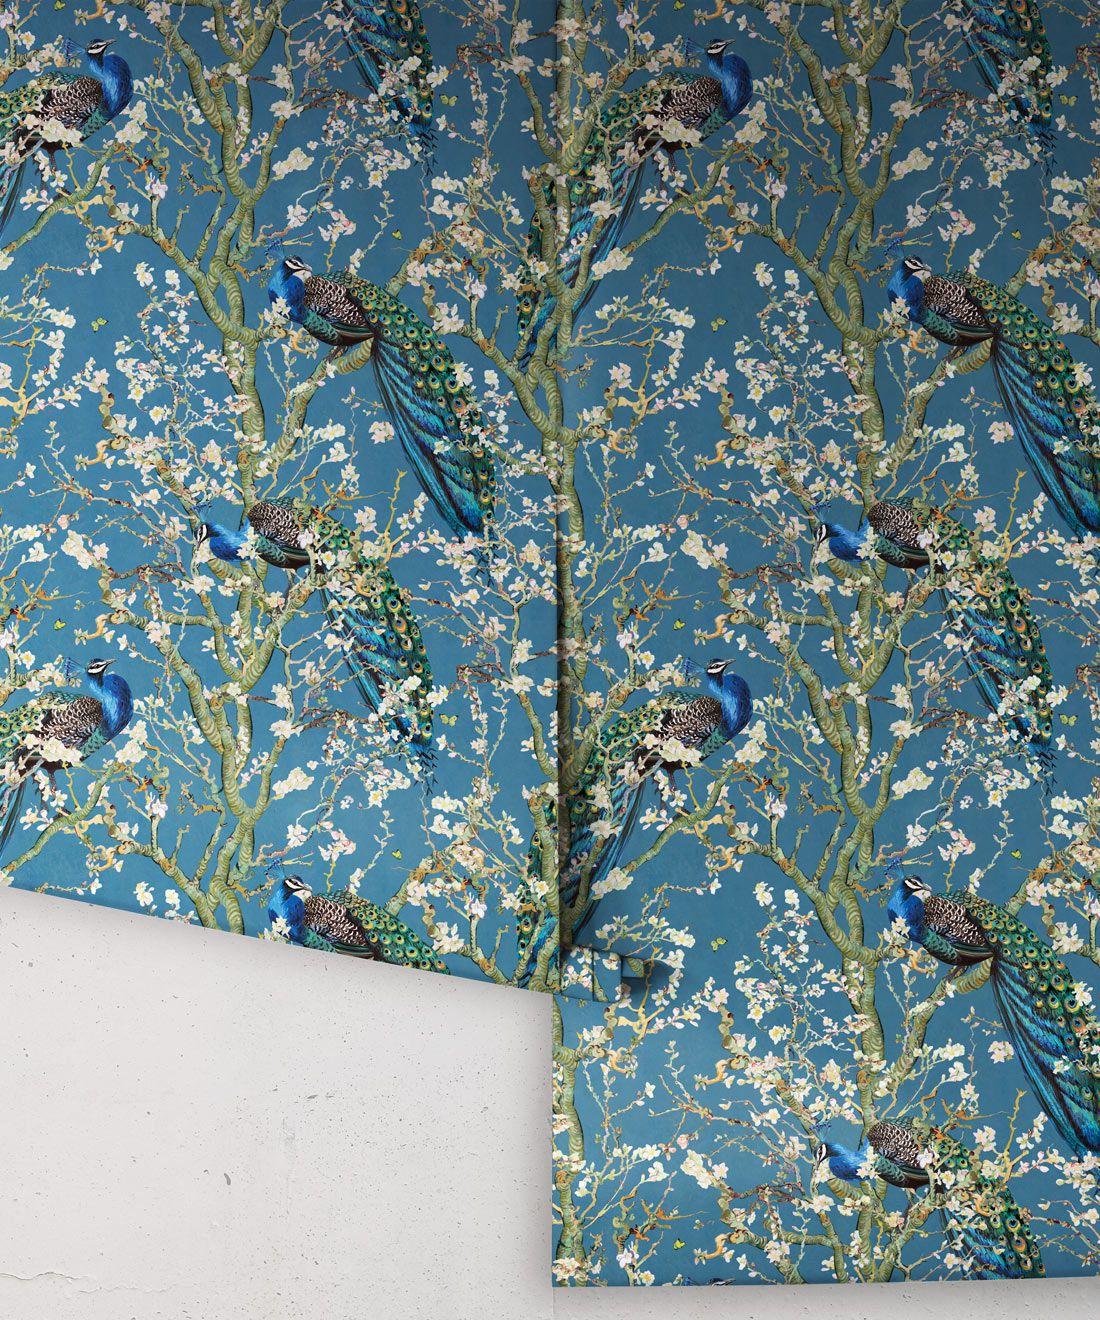 Almond Blossom Wallpaper • Chinoiserie Wallpaper • Wallpaper with Peacocks • Royal Blue Wallpaper •Rolls